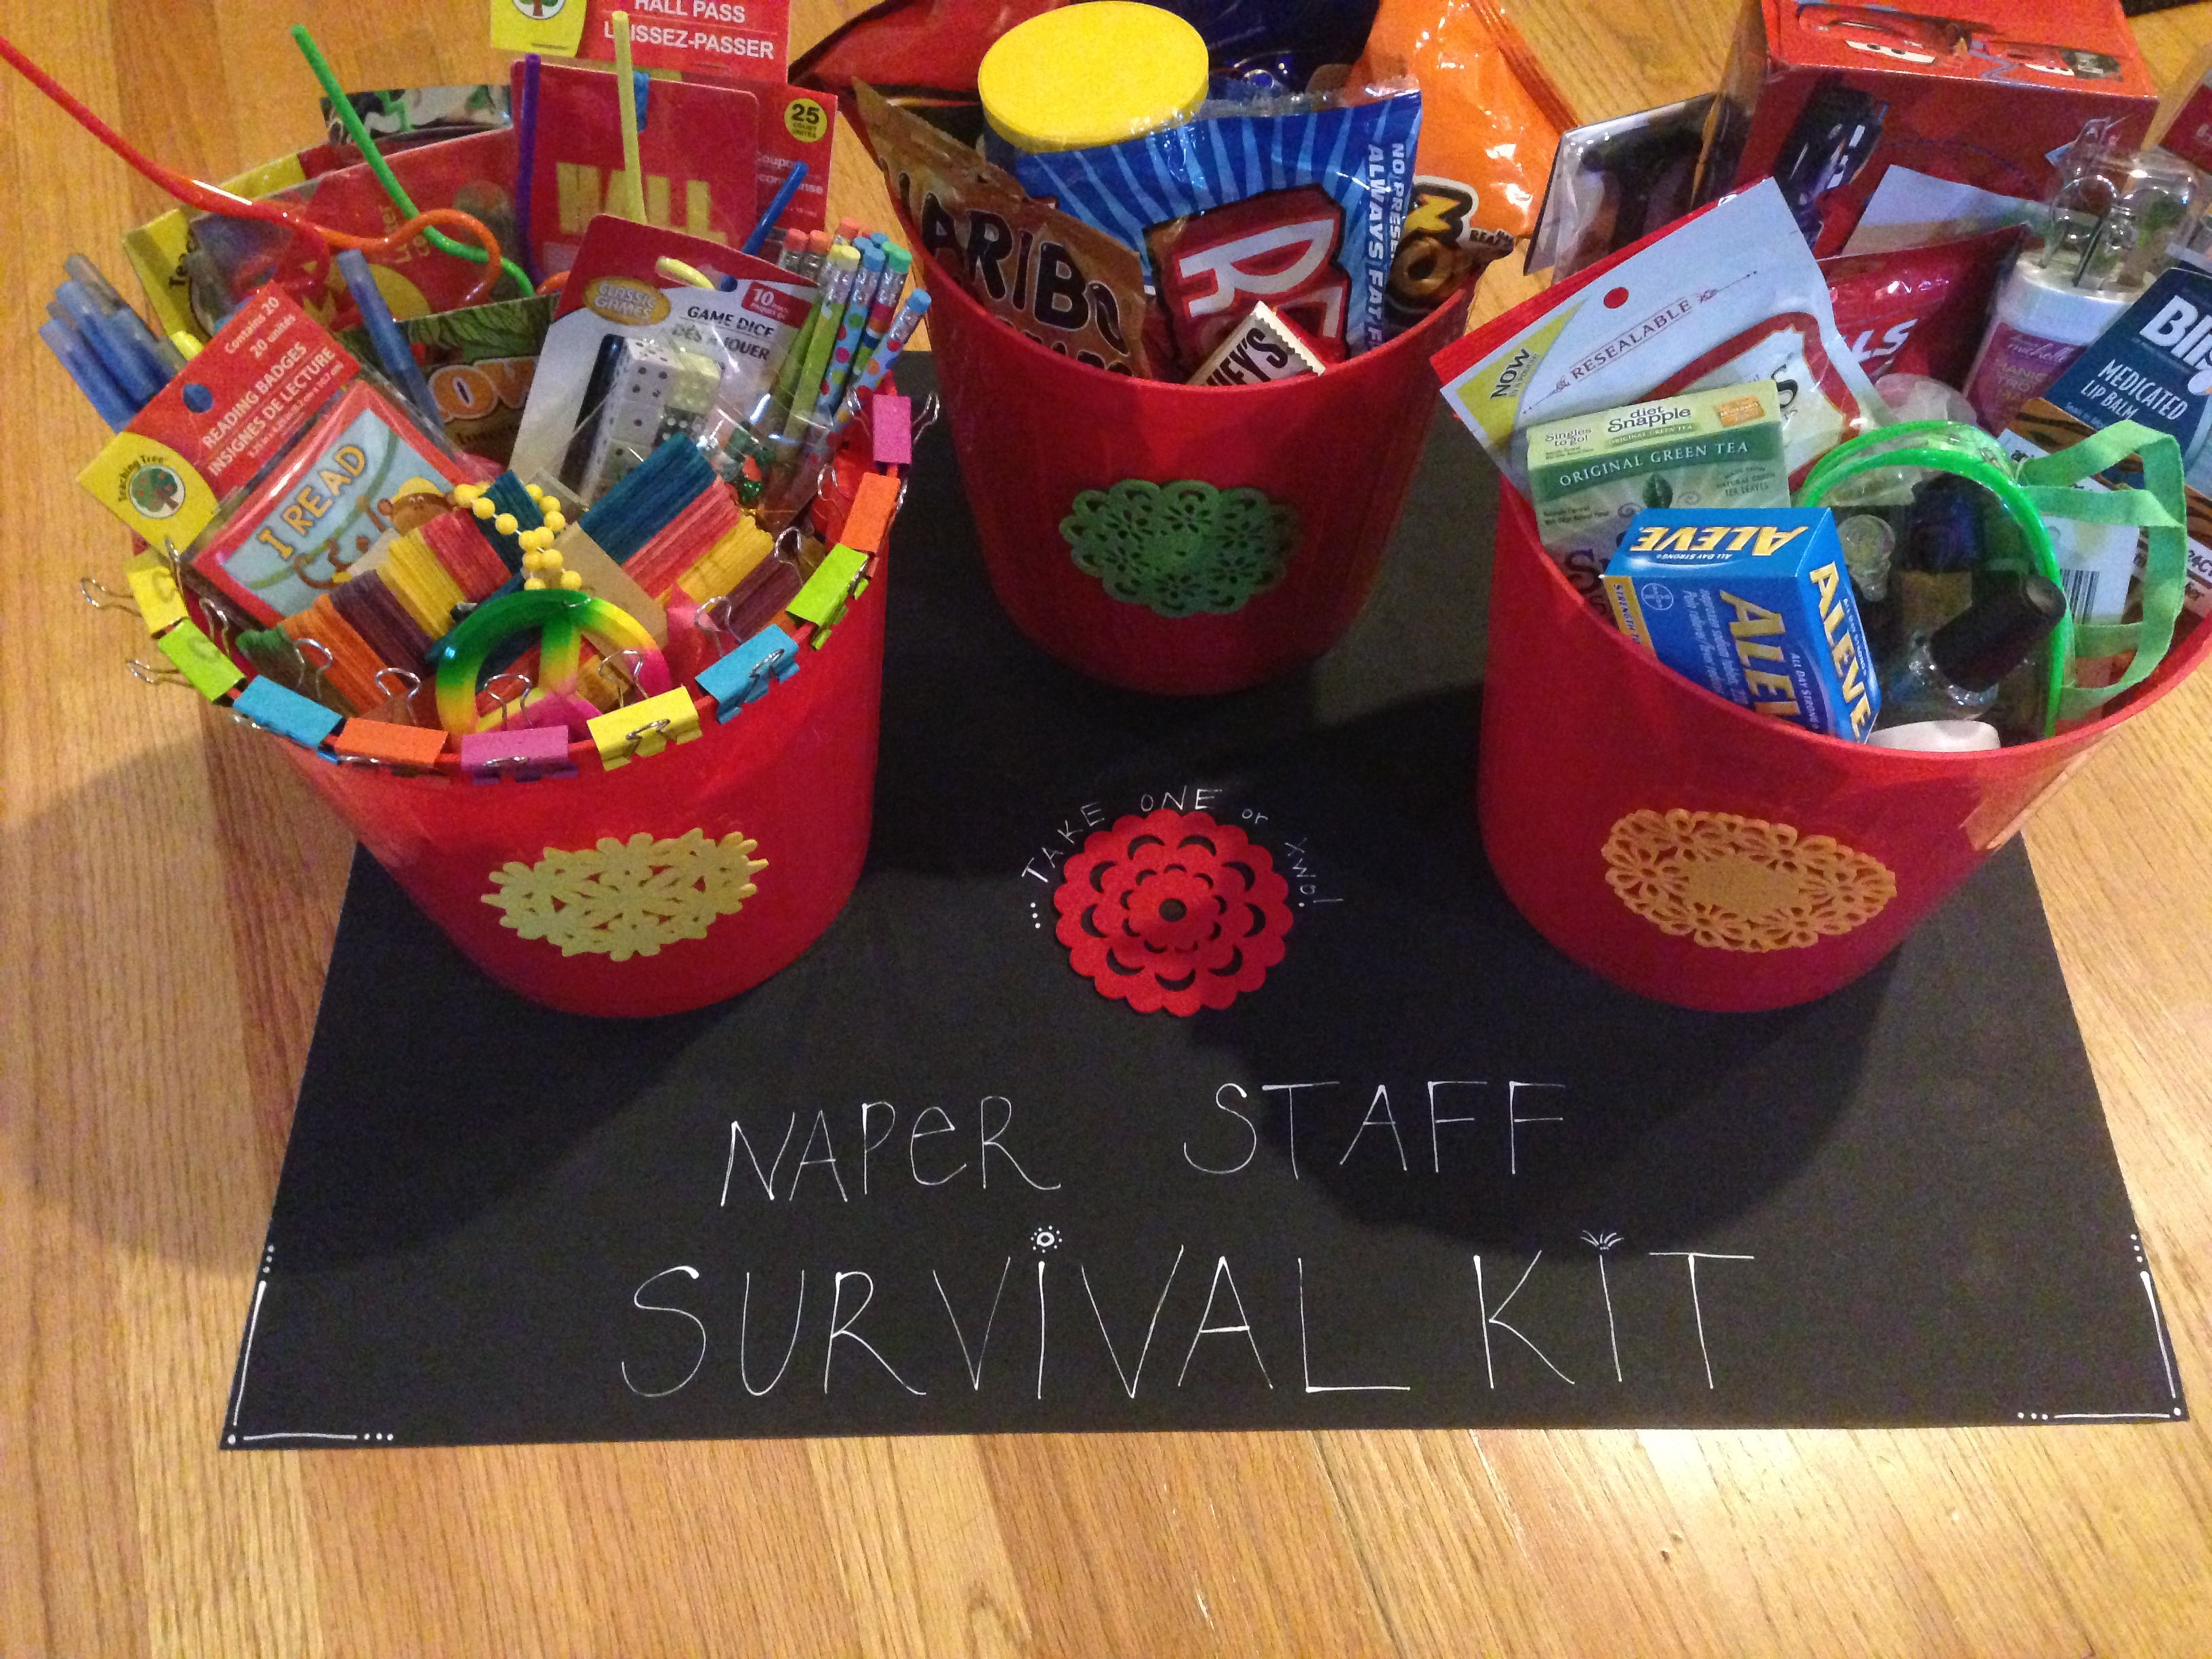 Back To School Survival Kit At Naper School I Hope They Like It School Survival Kits School Survival Aleve